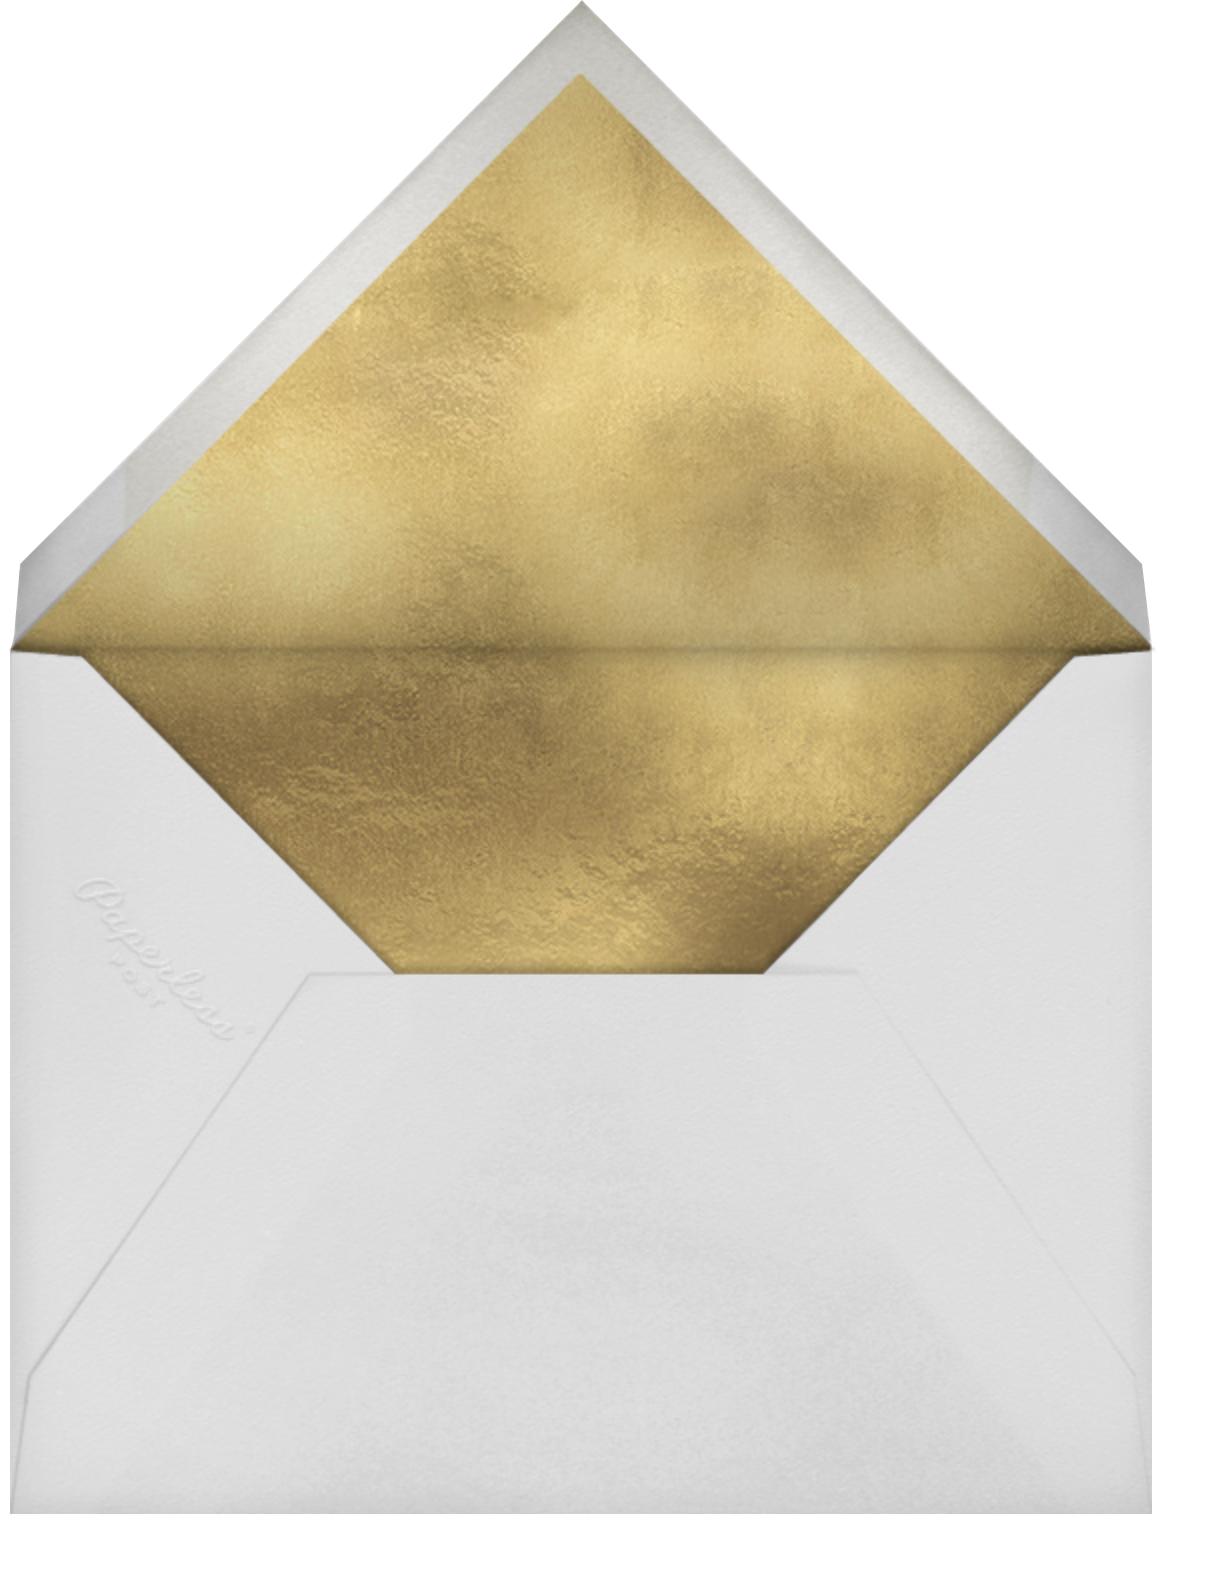 Cuore - Burnt Caramel - Venamour - Photo  - envelope back